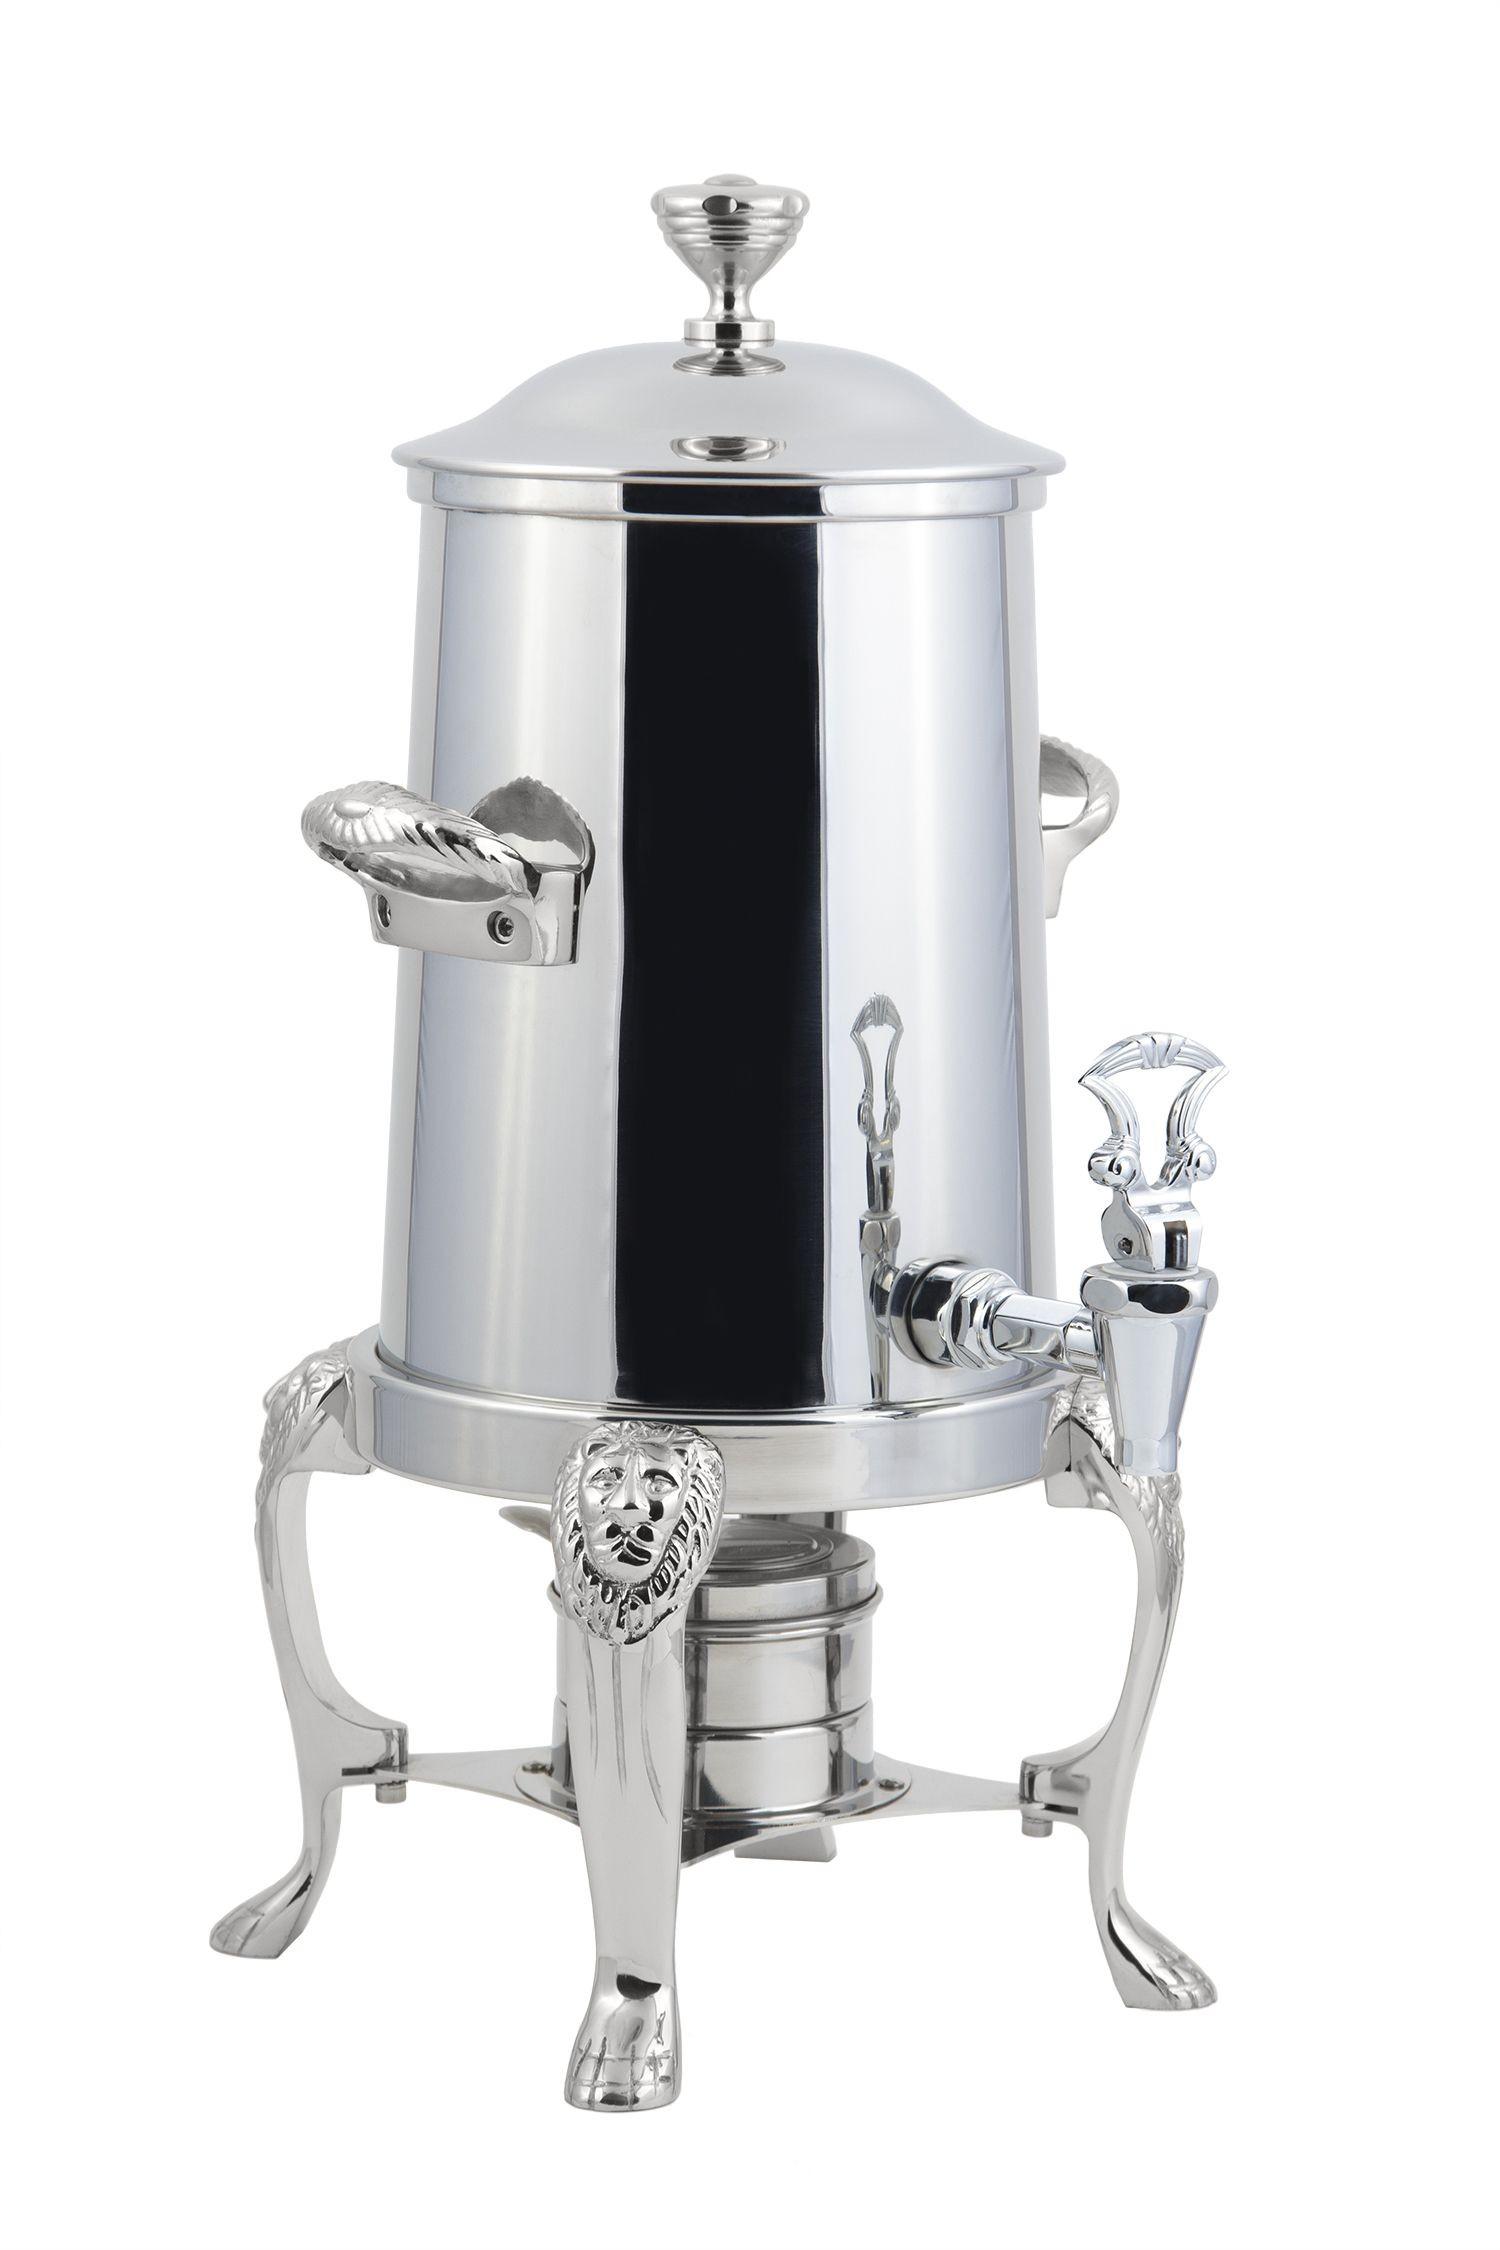 Bon Chef 48103C Lion Non-Insulated Coffee Urn with Chrome Trim, 3 1/2 Gallon